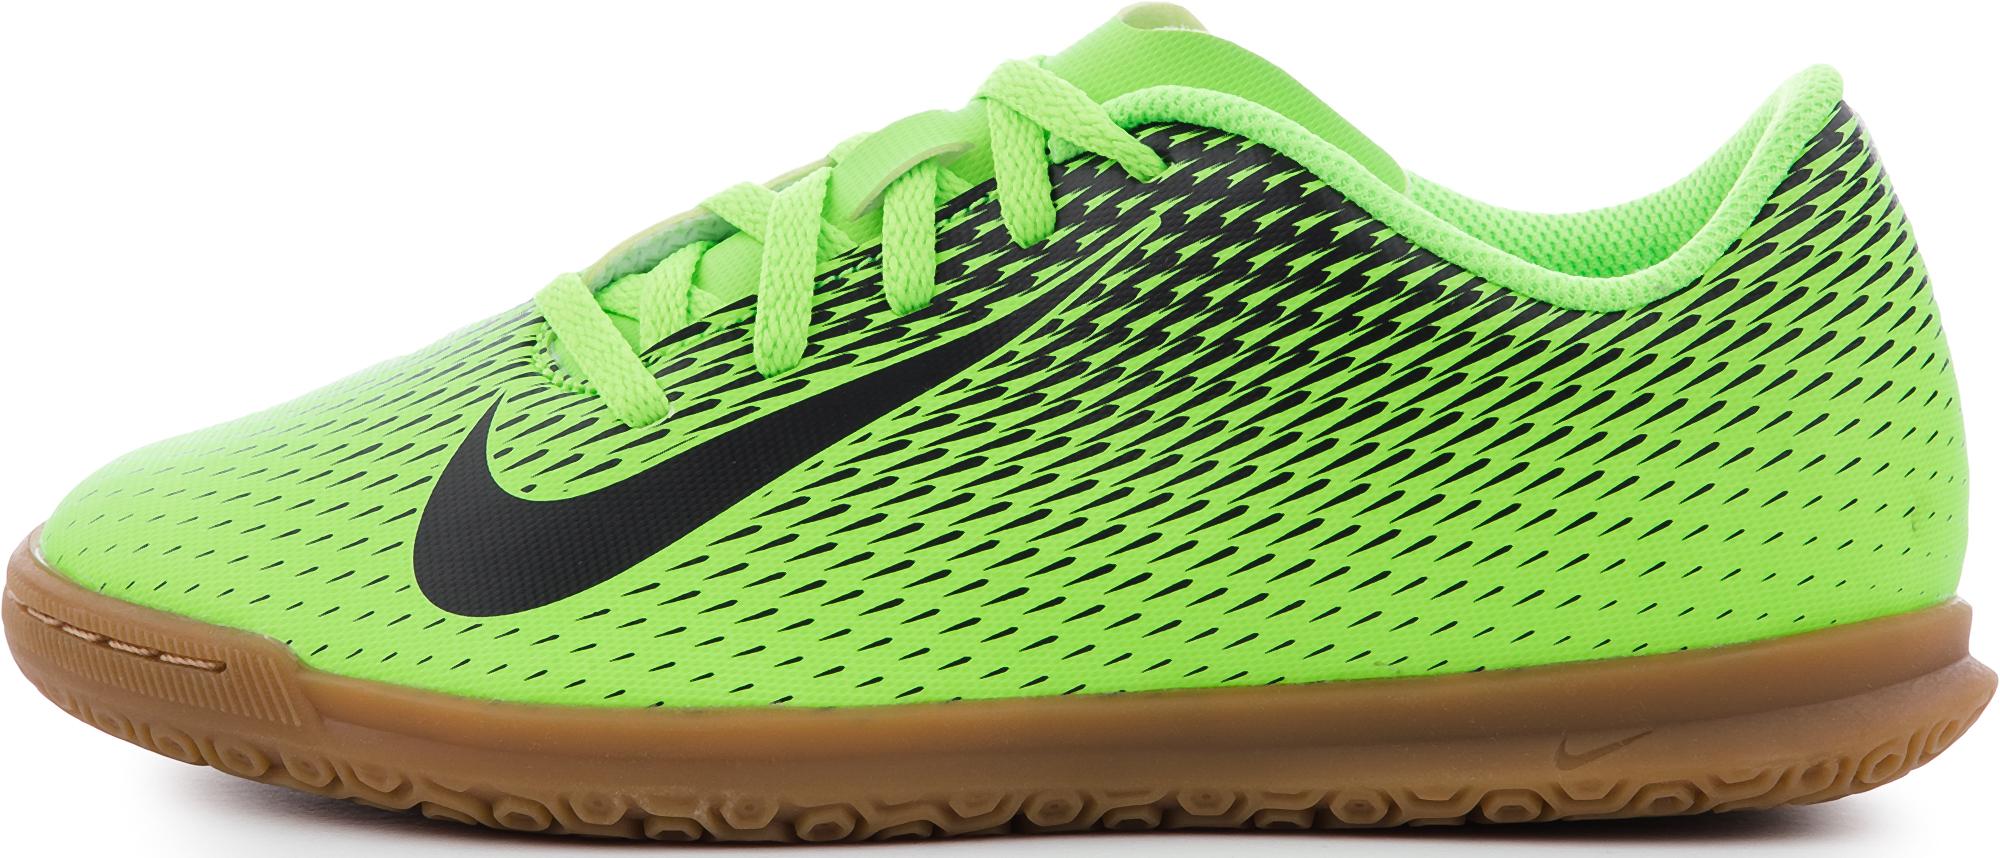 Nike Бутсы для мальчиков Bravatax Ii Ic, размер 37,5